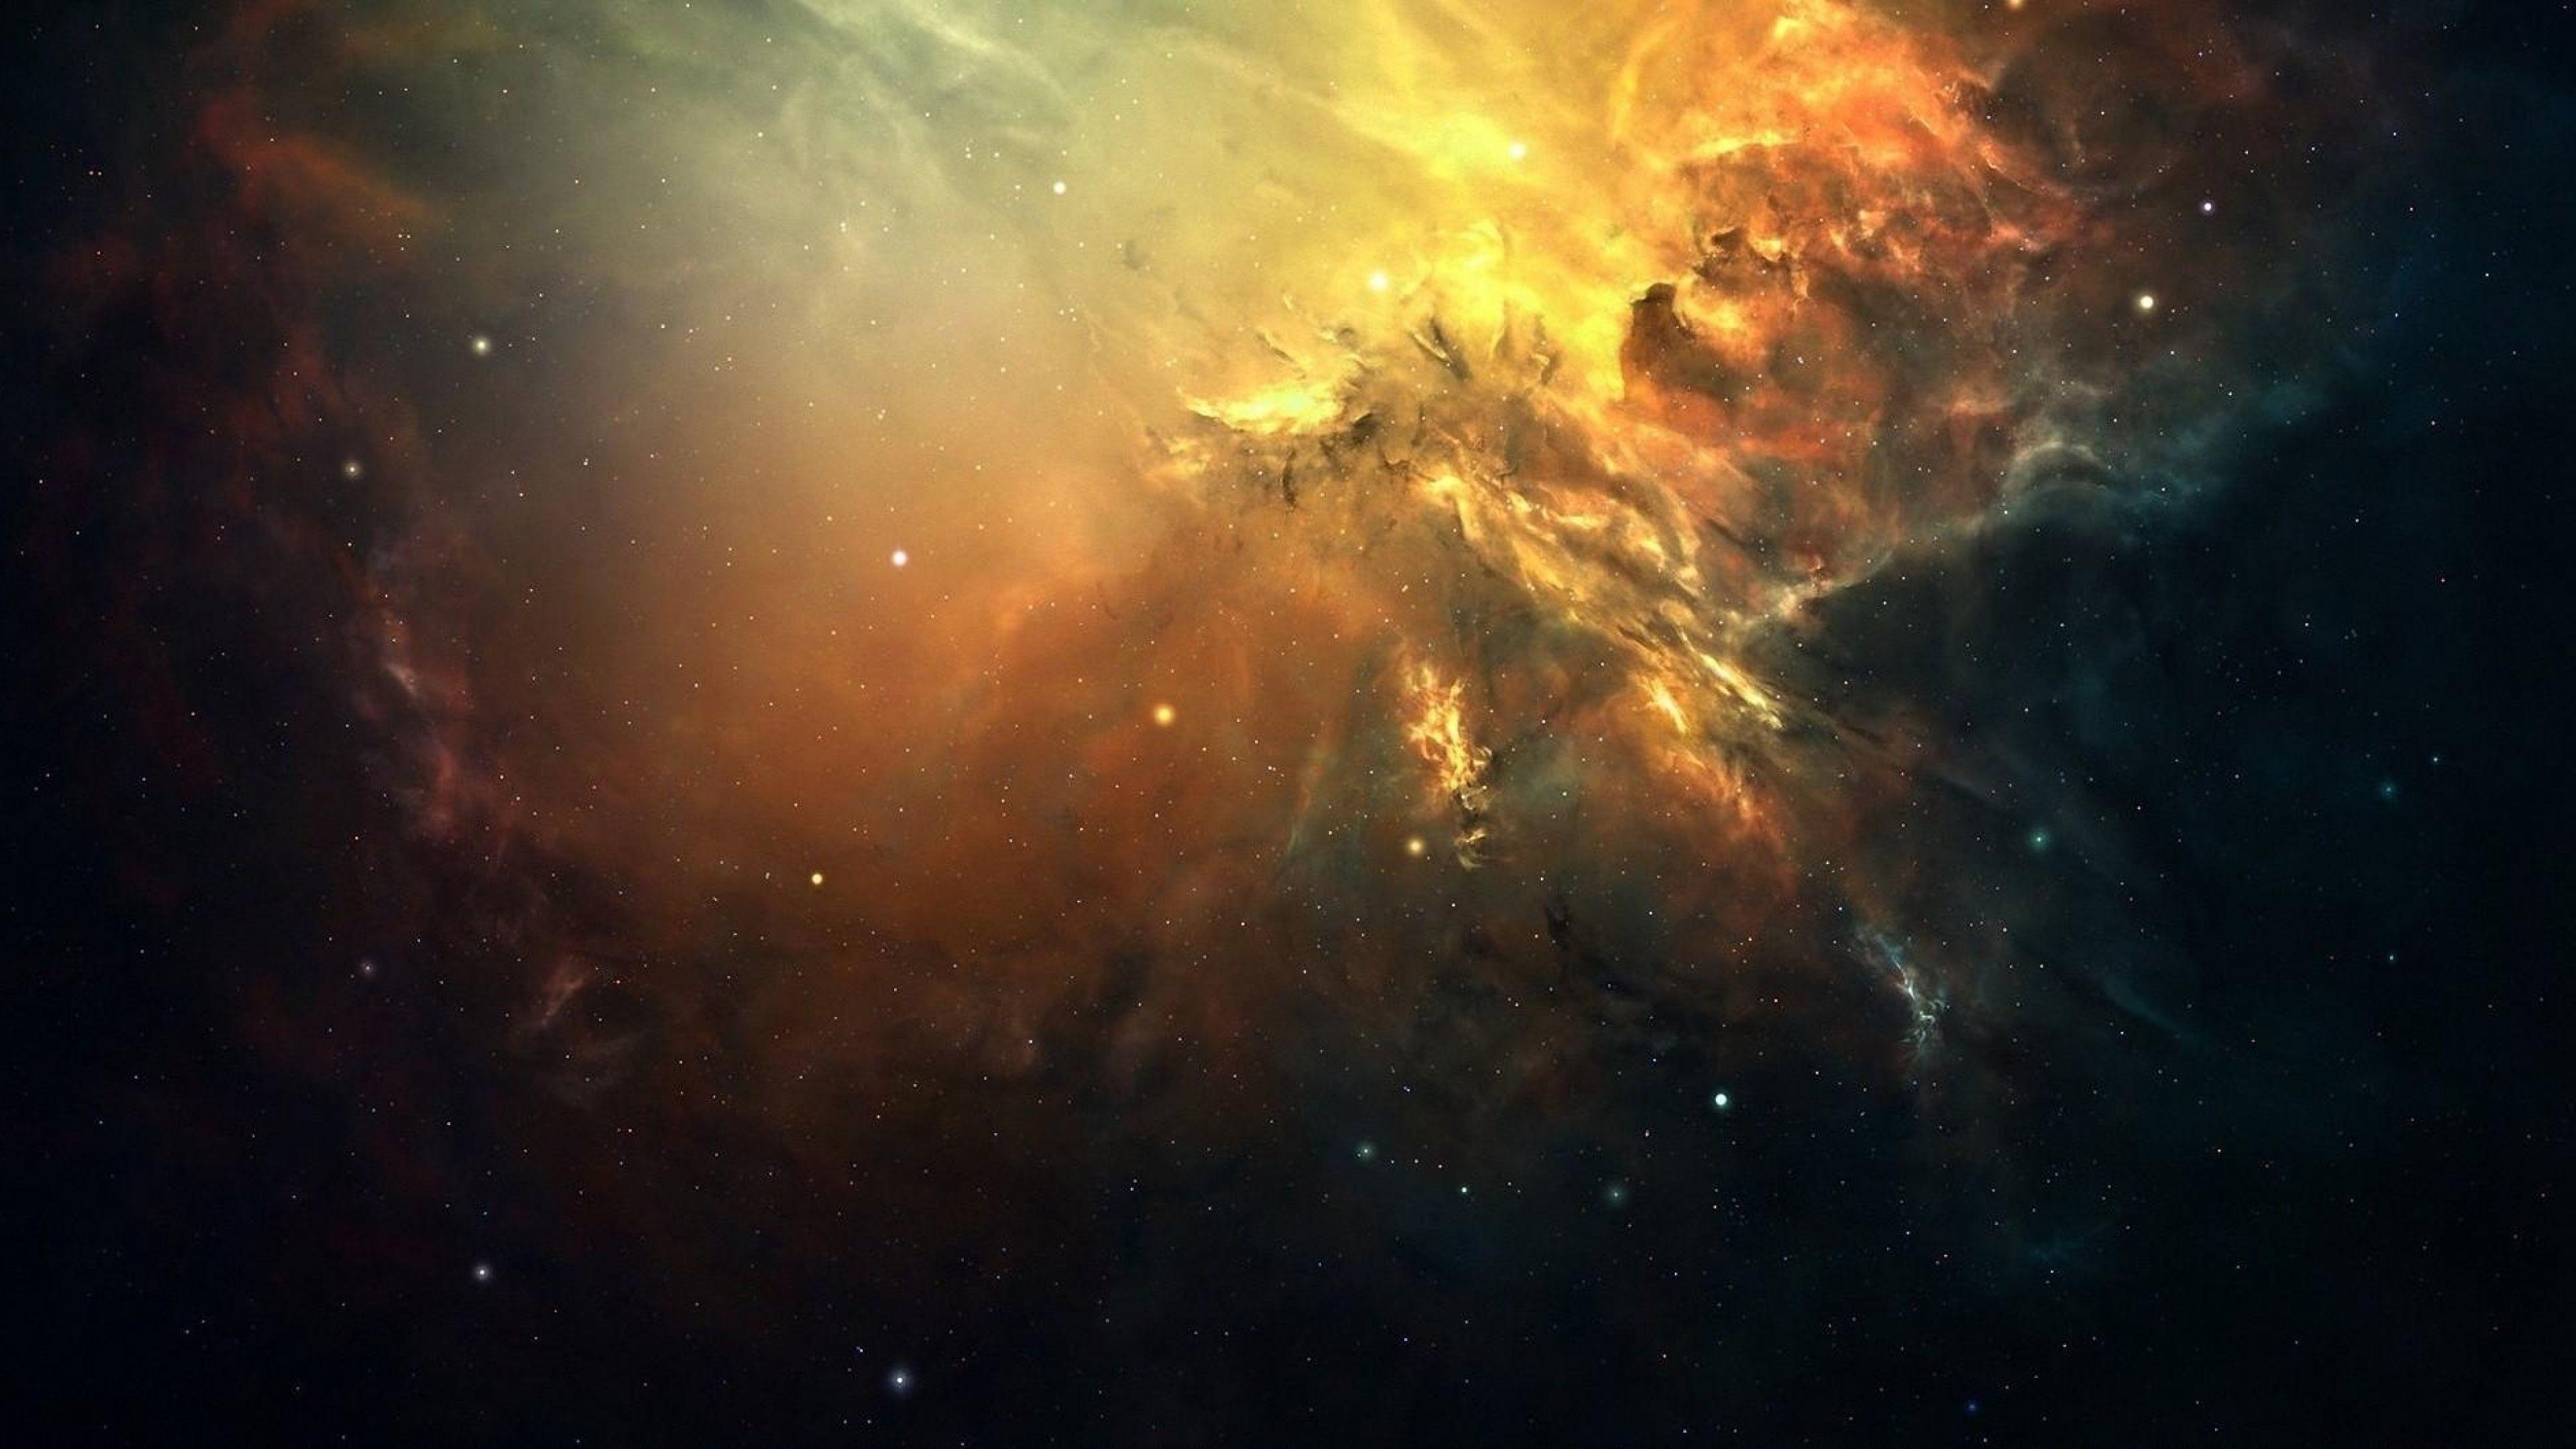 Galaxy Wallpaper 4K (48+ Images